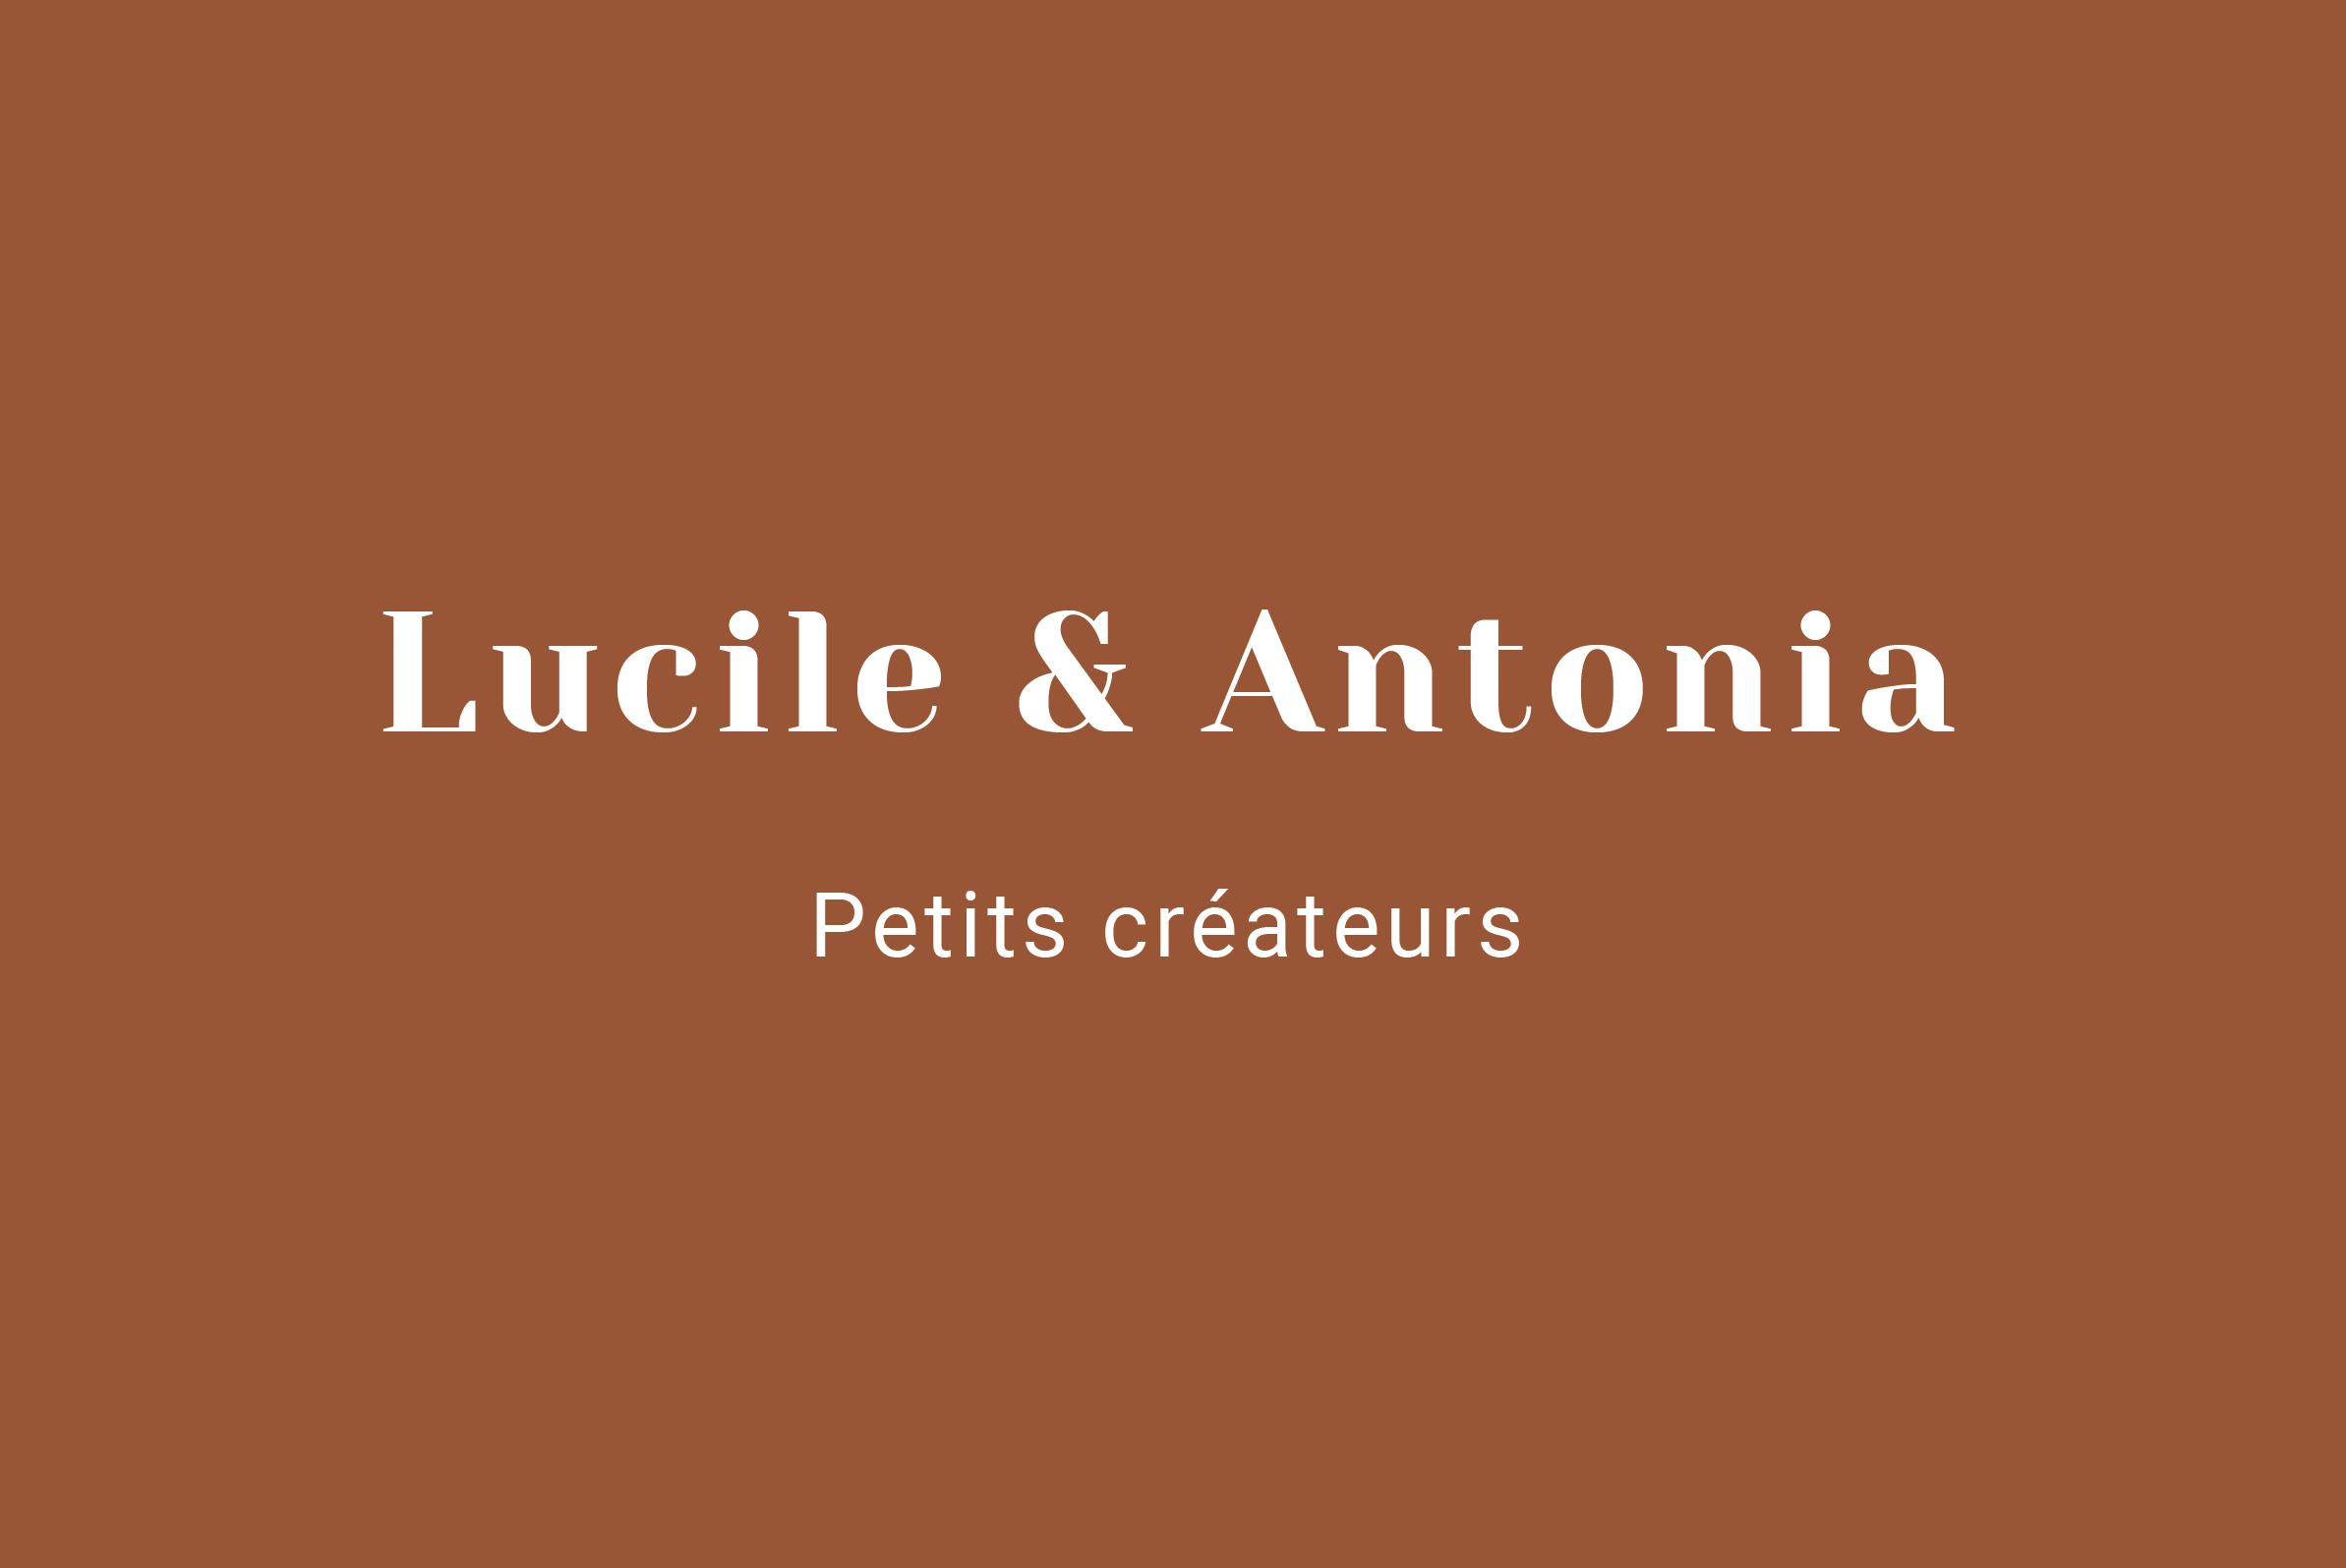 lucile&antonia_galerie.victorinepiot.com.png